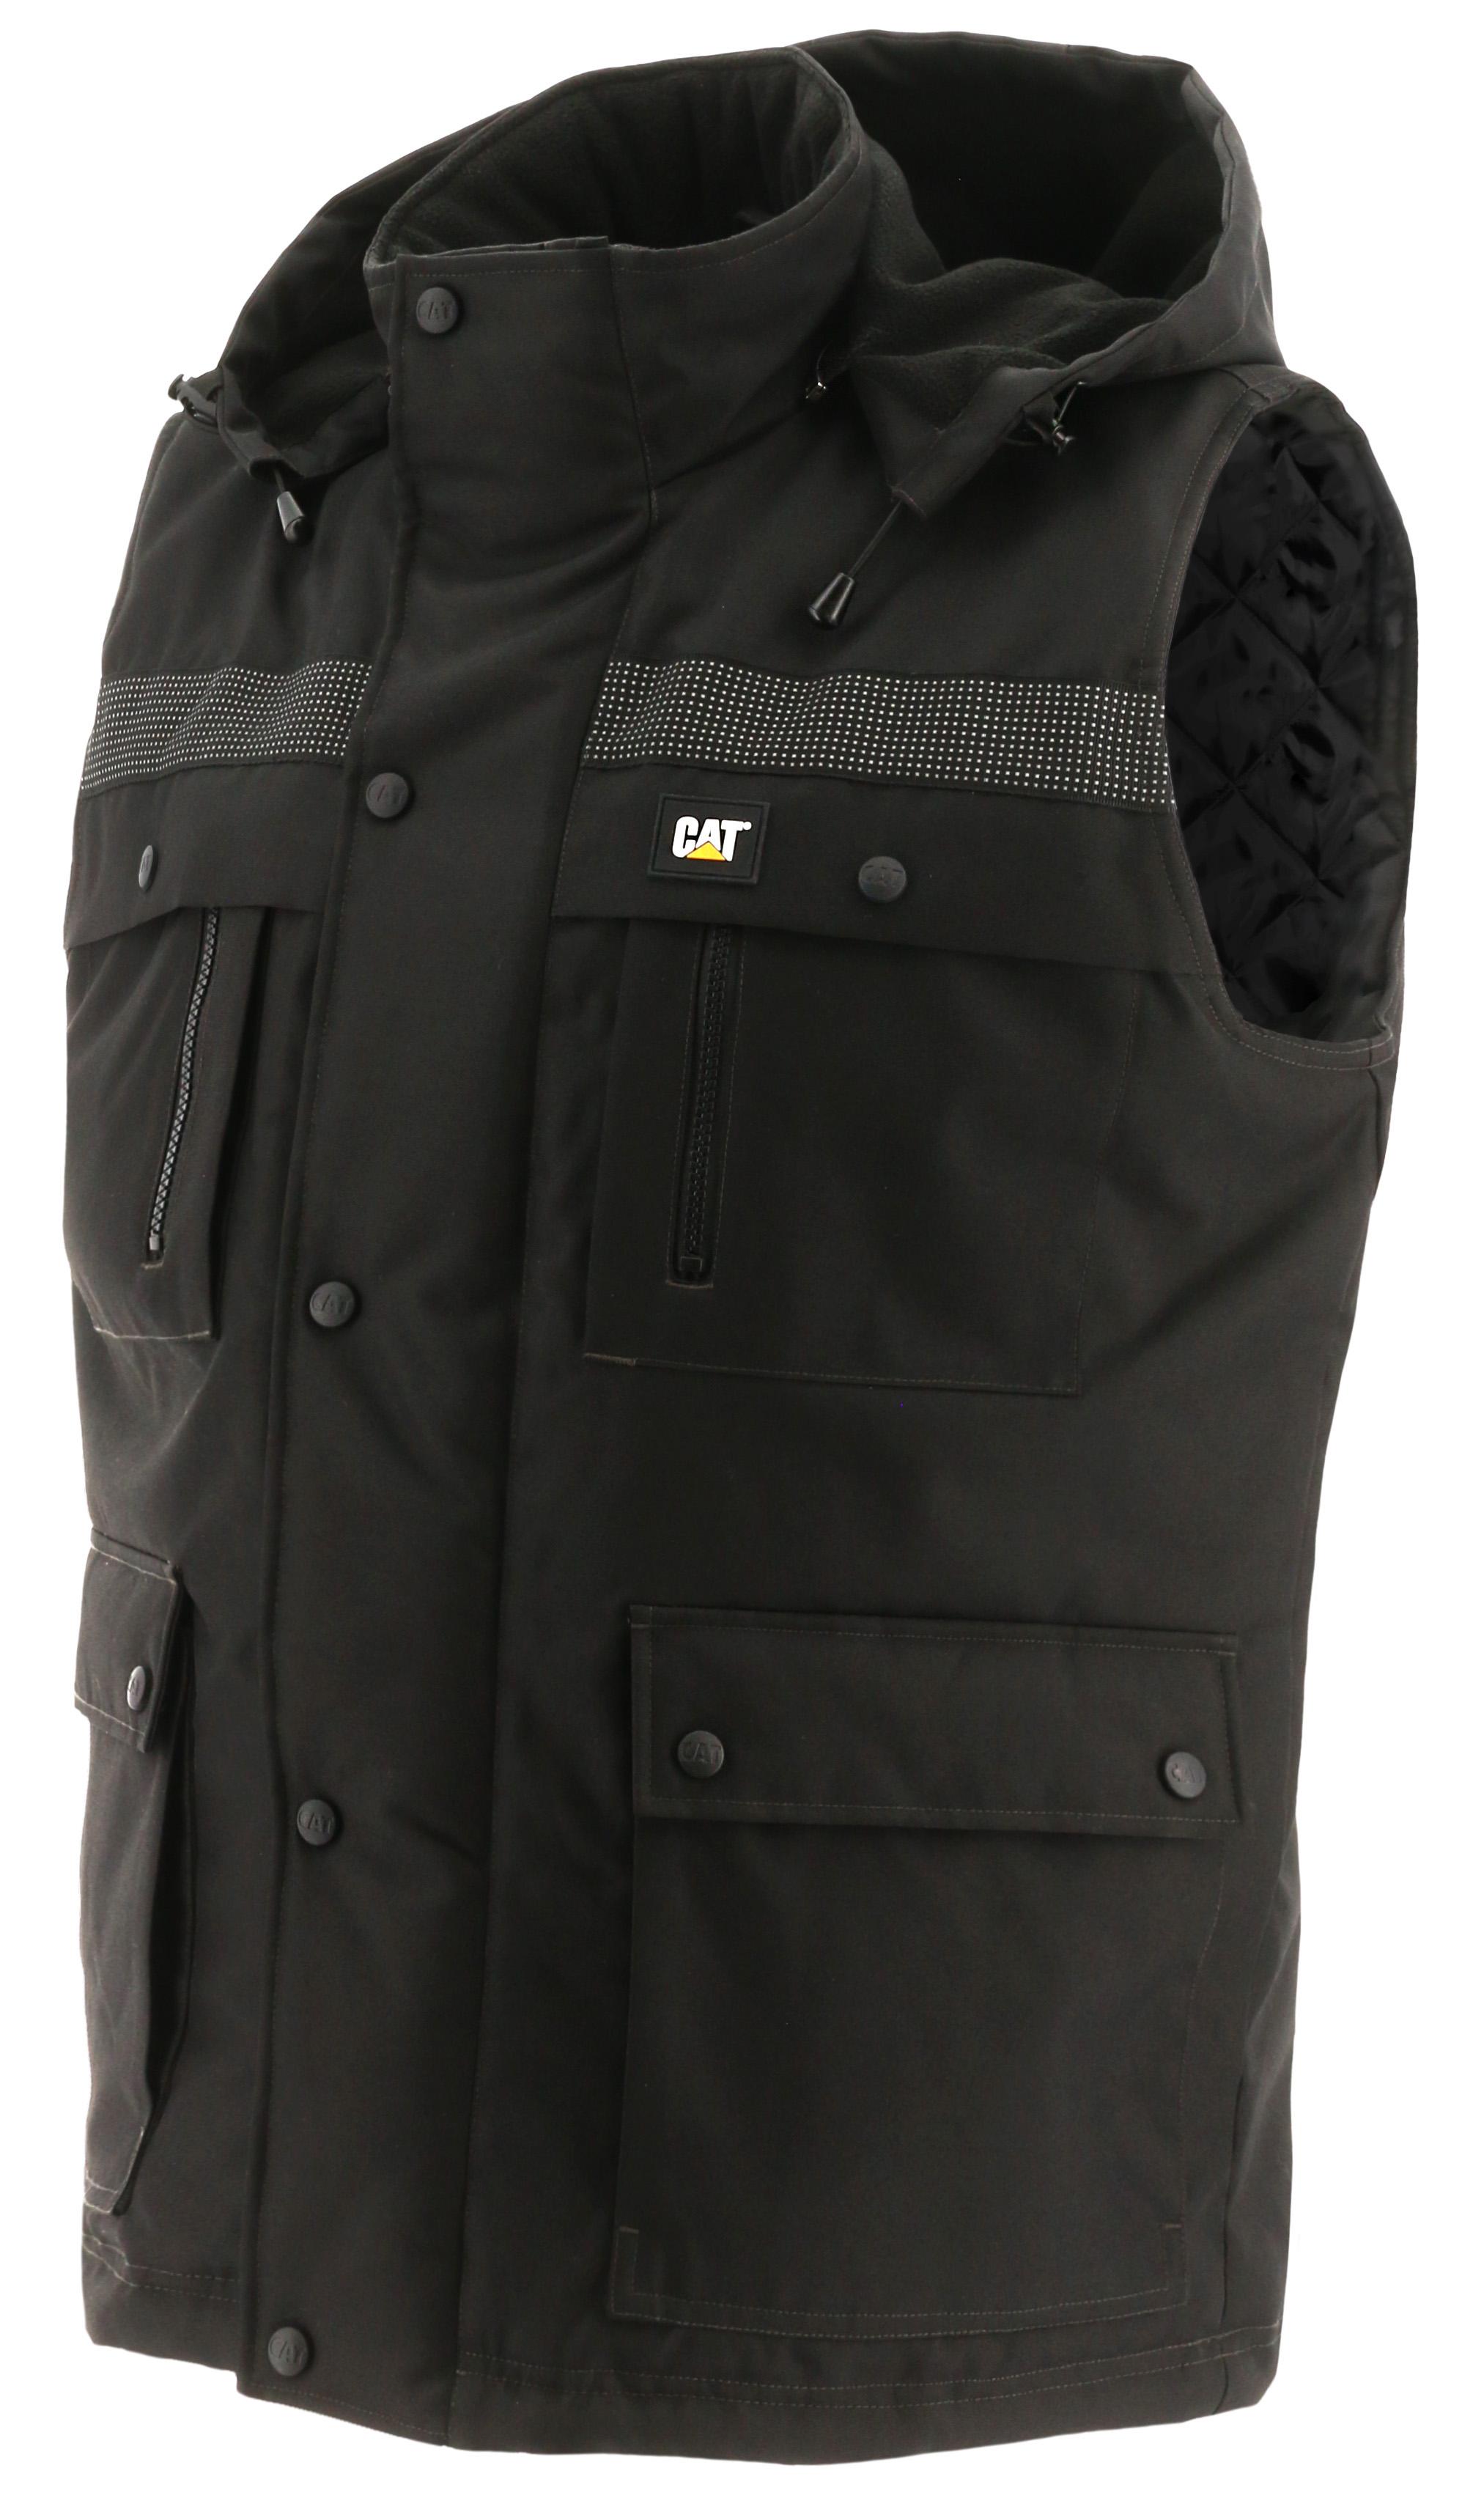 CAT Caterpillar Defender Insulated Jacket Mens Water Resistant Quilted Work Coat